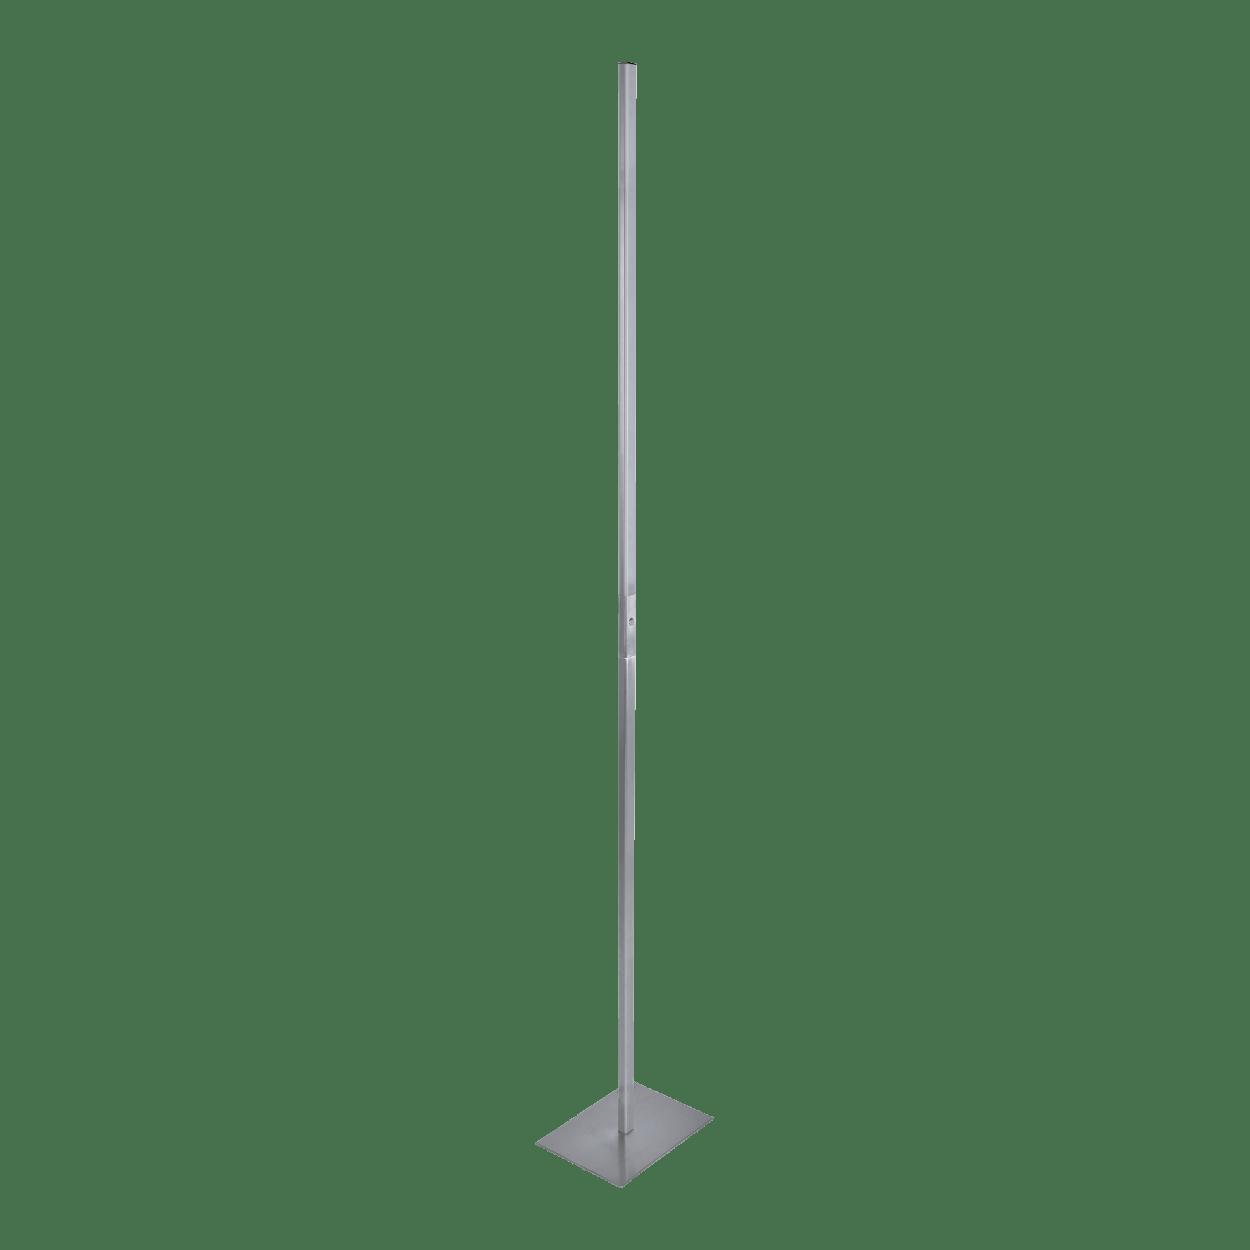 Led Stehlampe Gunstig Bei Aldi